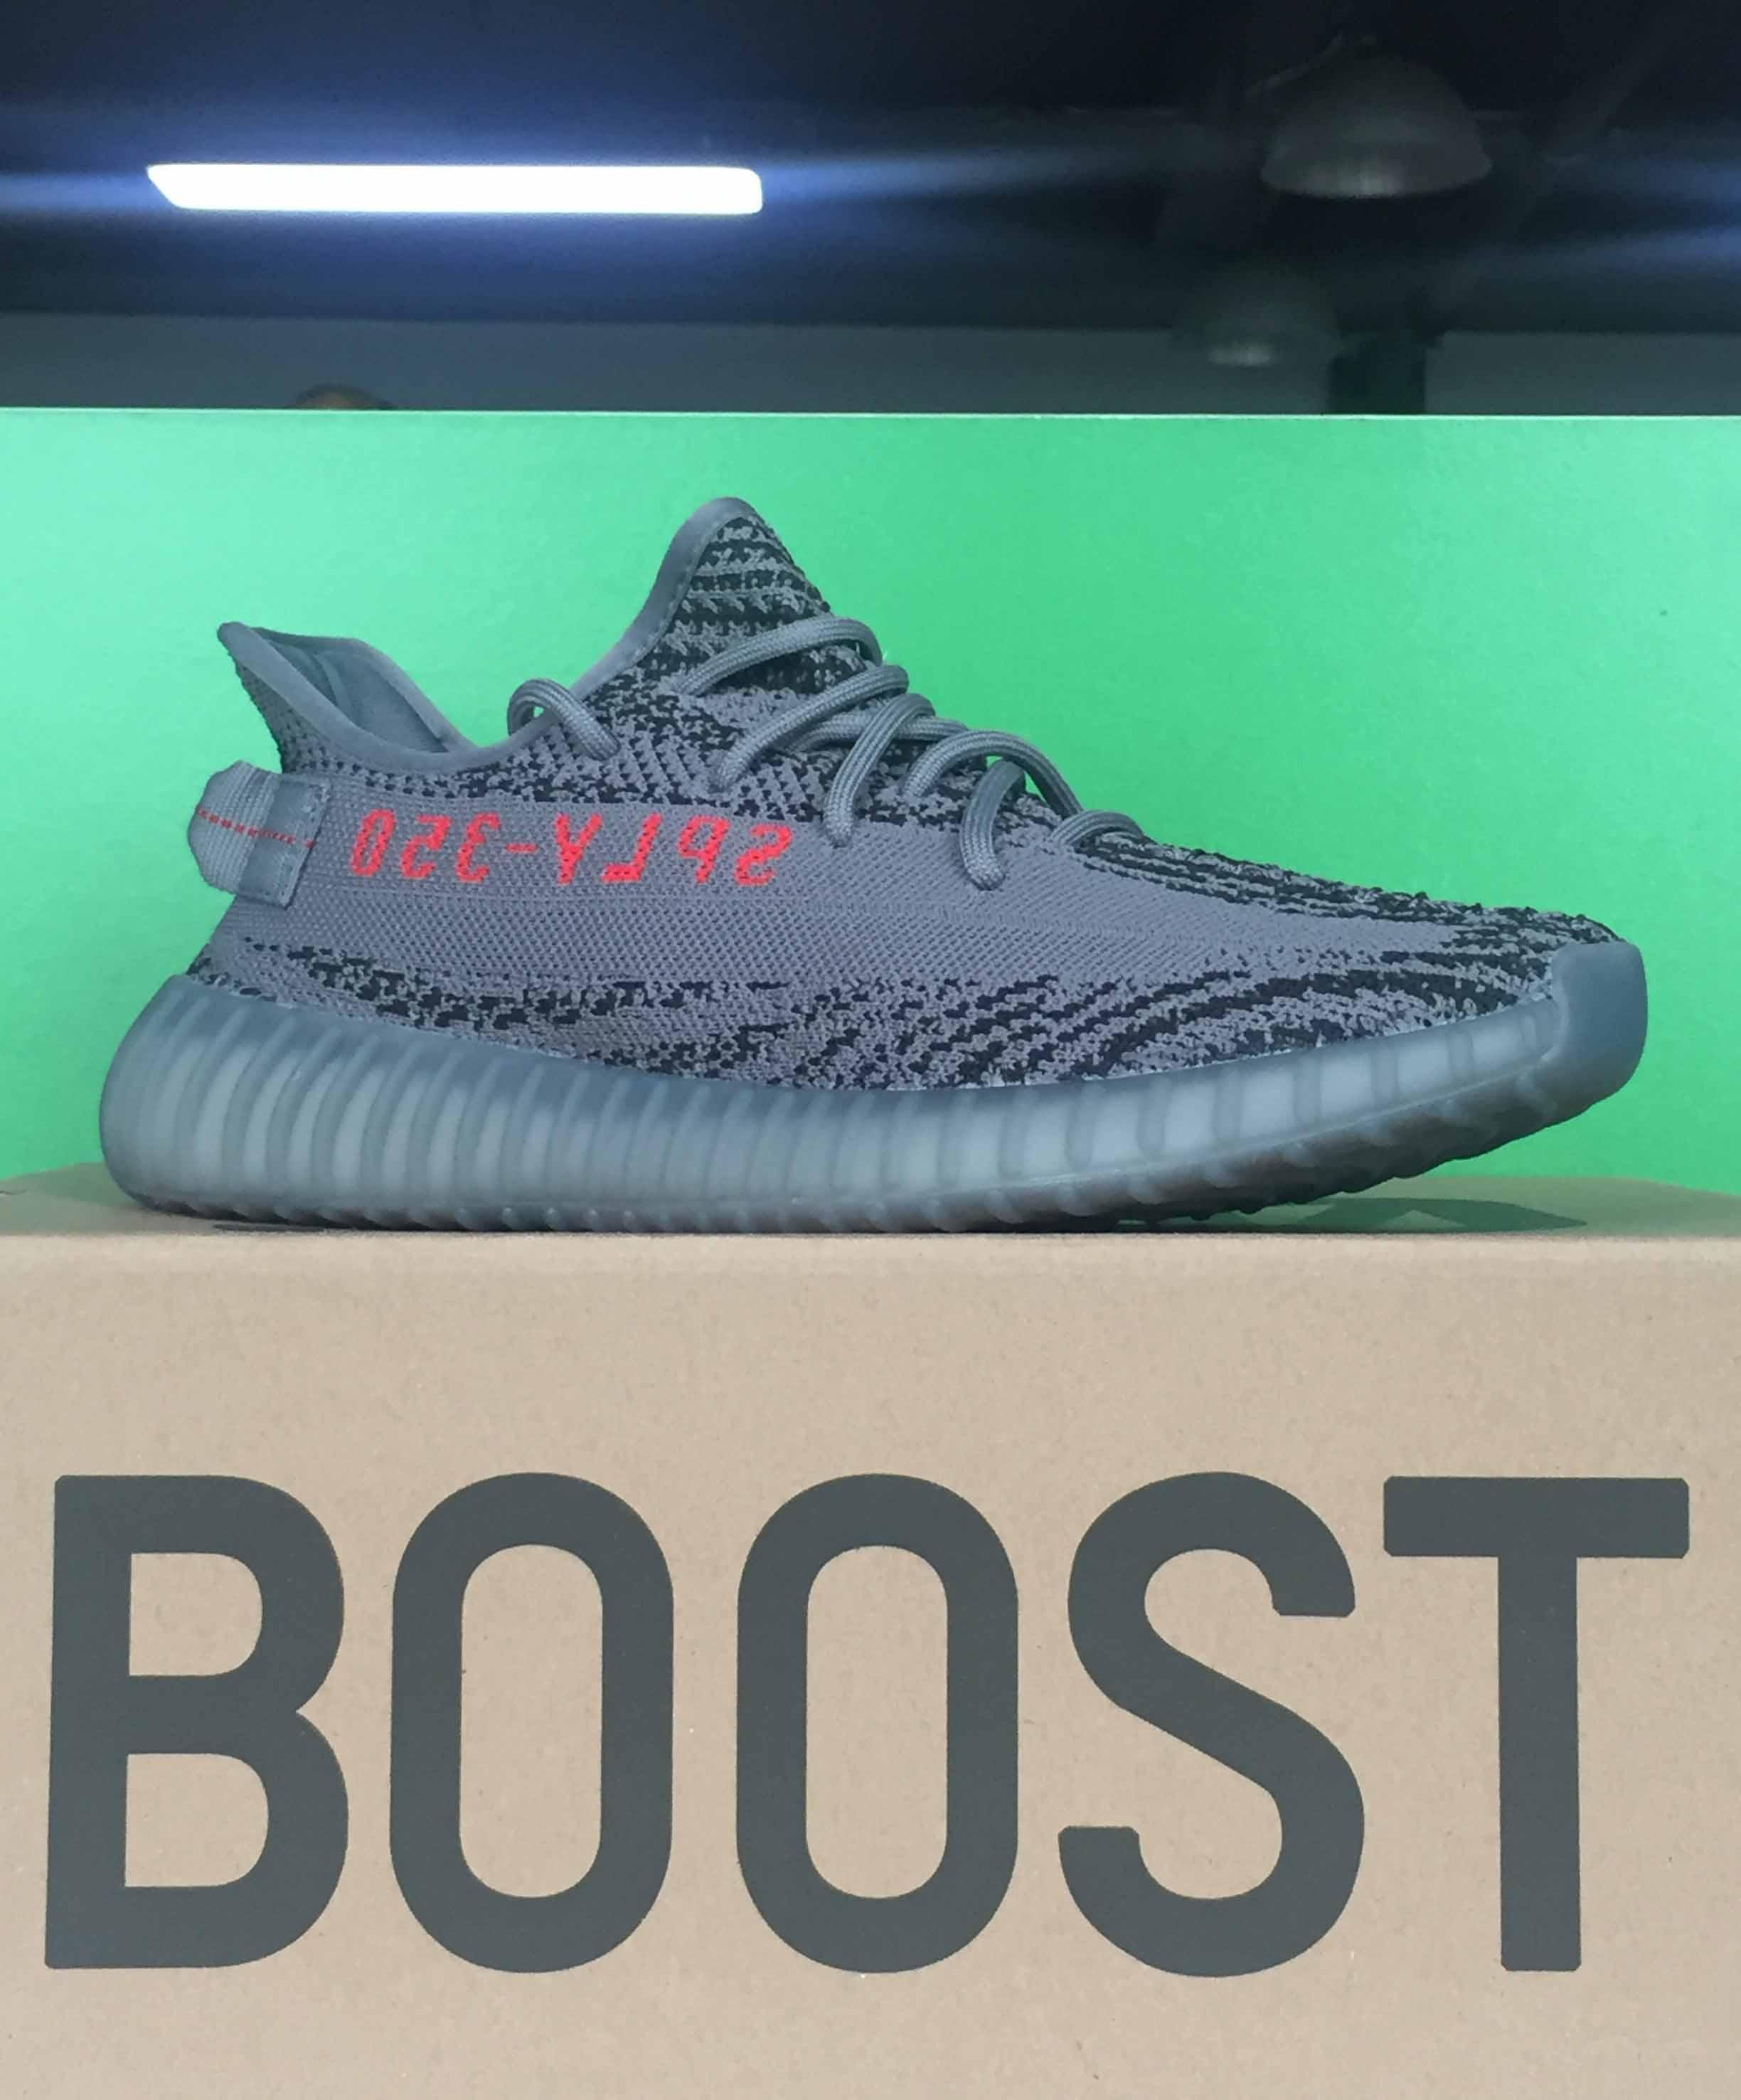 0d54572678bbd Originals Boost 350 V2 AH2203 Beluga 2.0 Snekers Zebra Kanye West Running  Shoes Cream White Dark Green Mens Sports Shoes Grey Stripe Sneaker Sports  Shoes ...